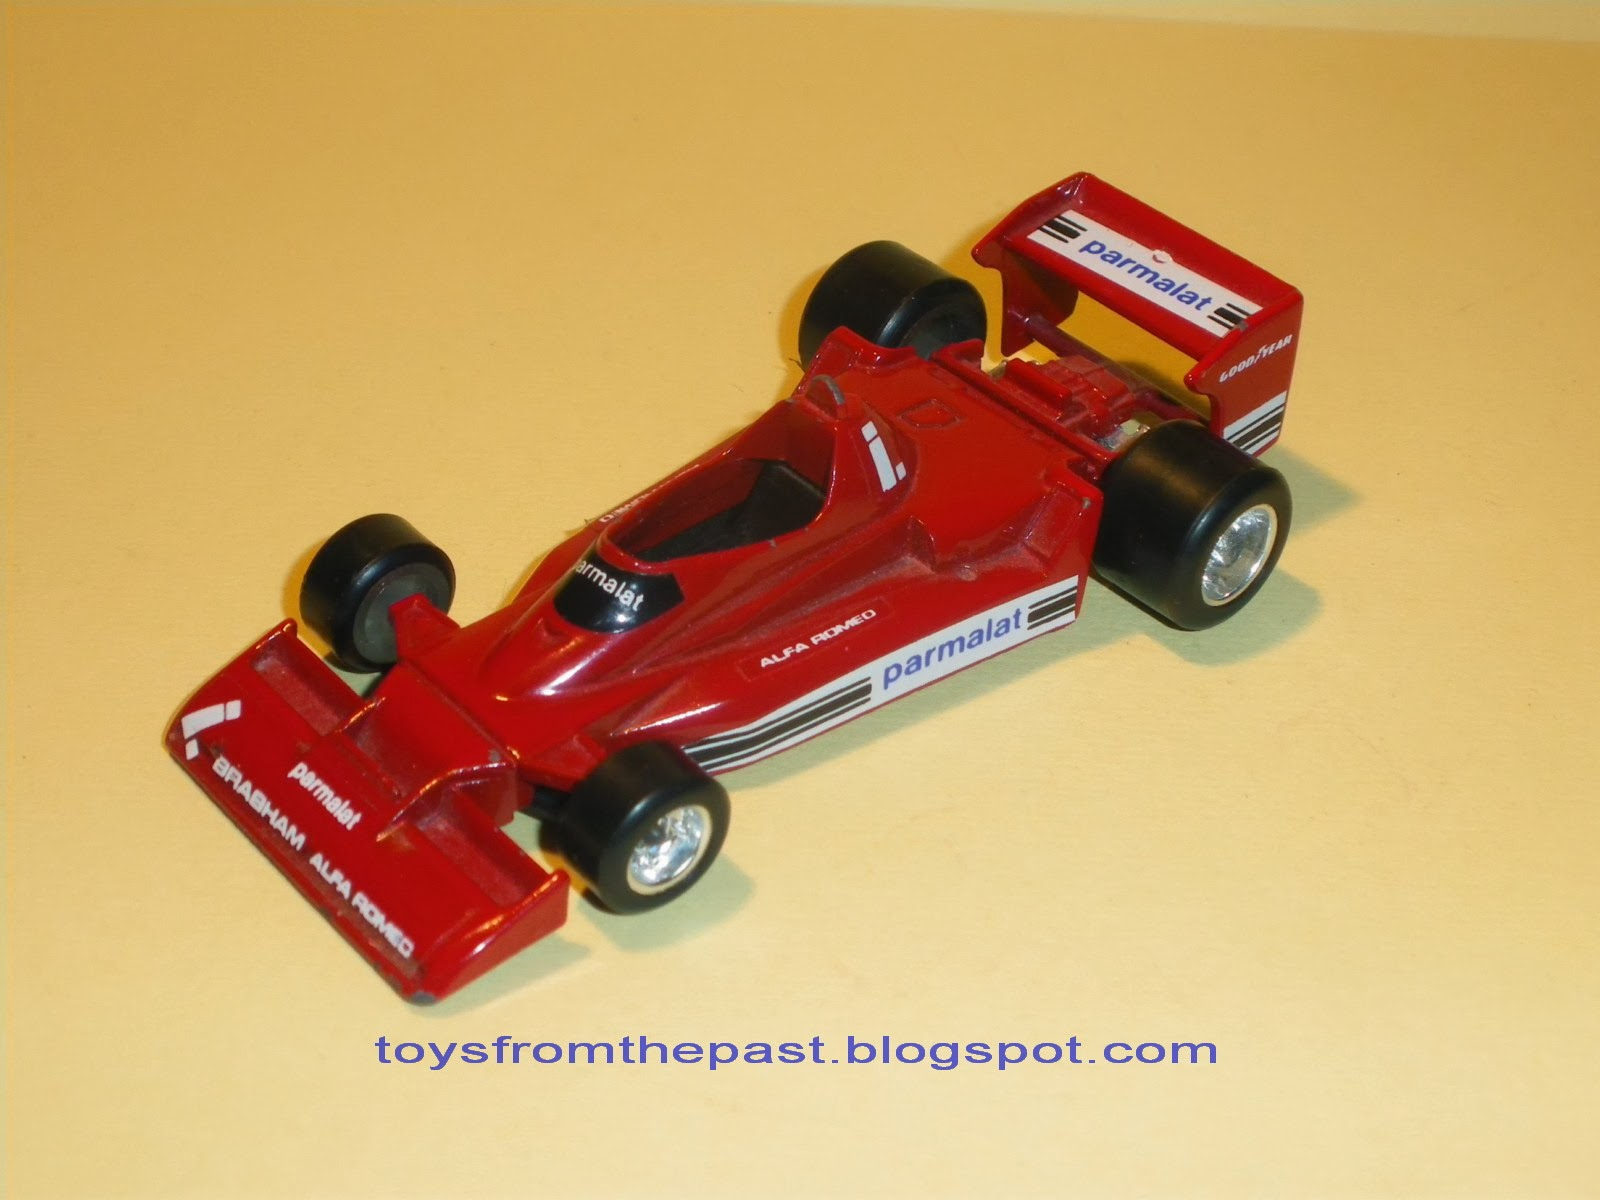 CE106, Brabham Alfa Romeo BT 45 c (1978). (cc-by-nc-nd 3.0 toysfromthepast)